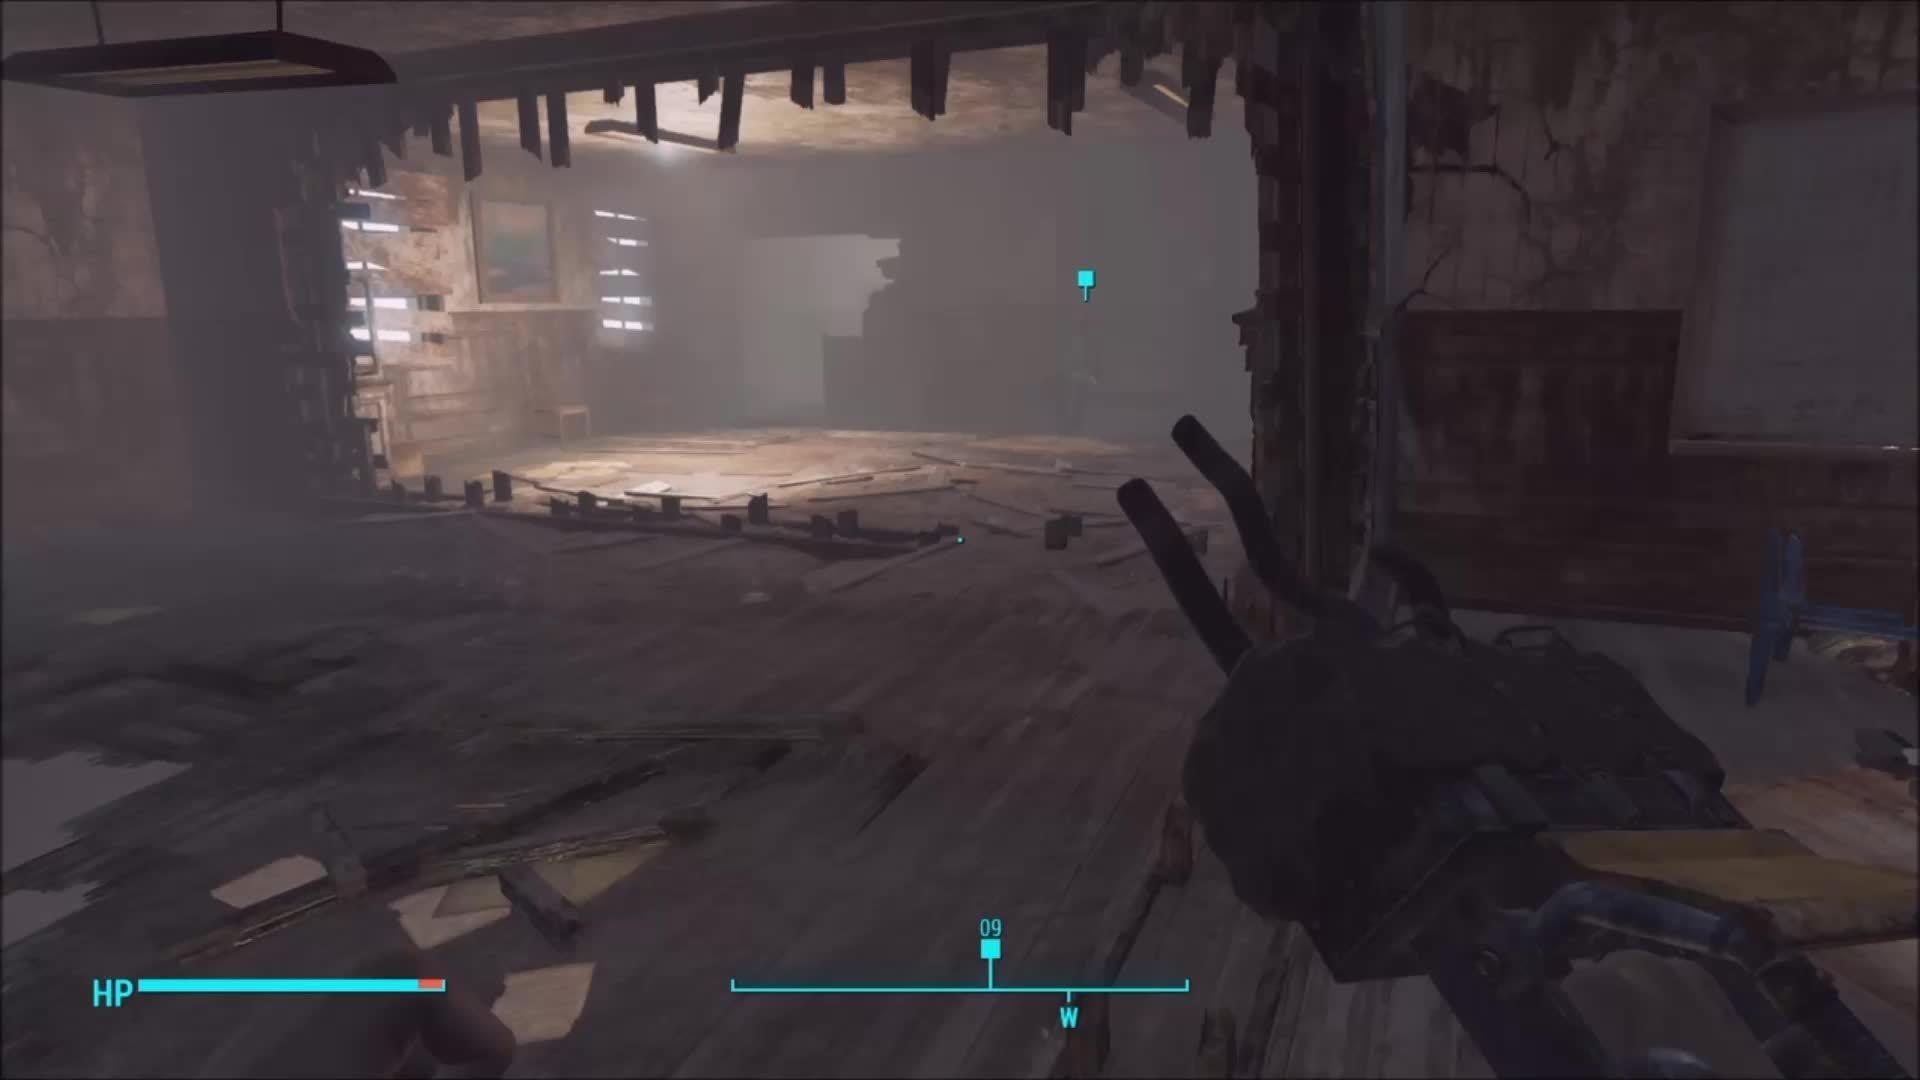 fo4, Fallout GIFs